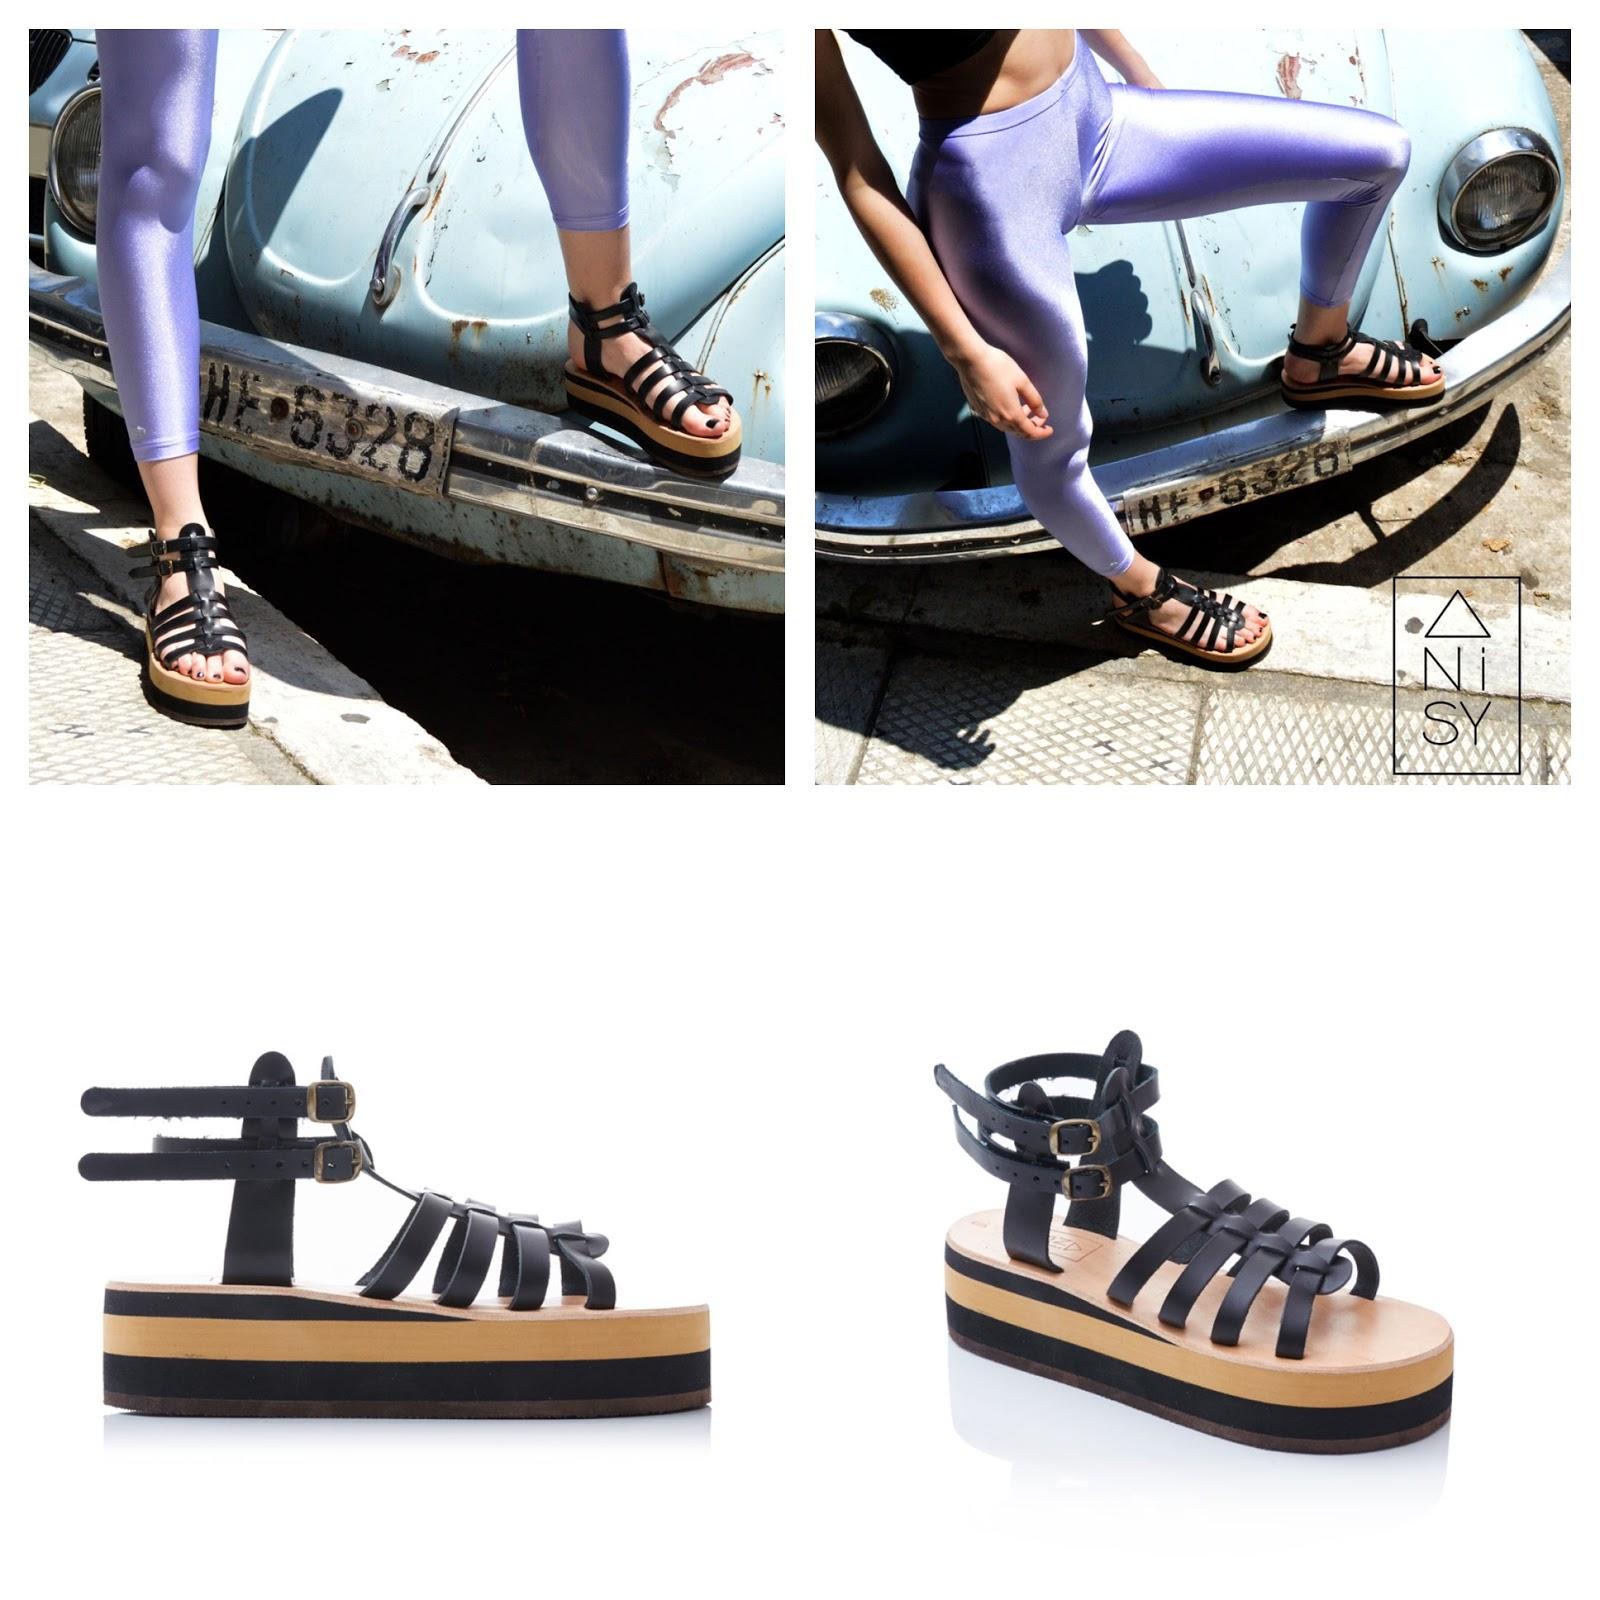 5ff9581a0336 The  Aplitis  Nude Beige Flatform Gladiator Sandals. The  Avgitis  Black Flatform  Gladiator Sandals